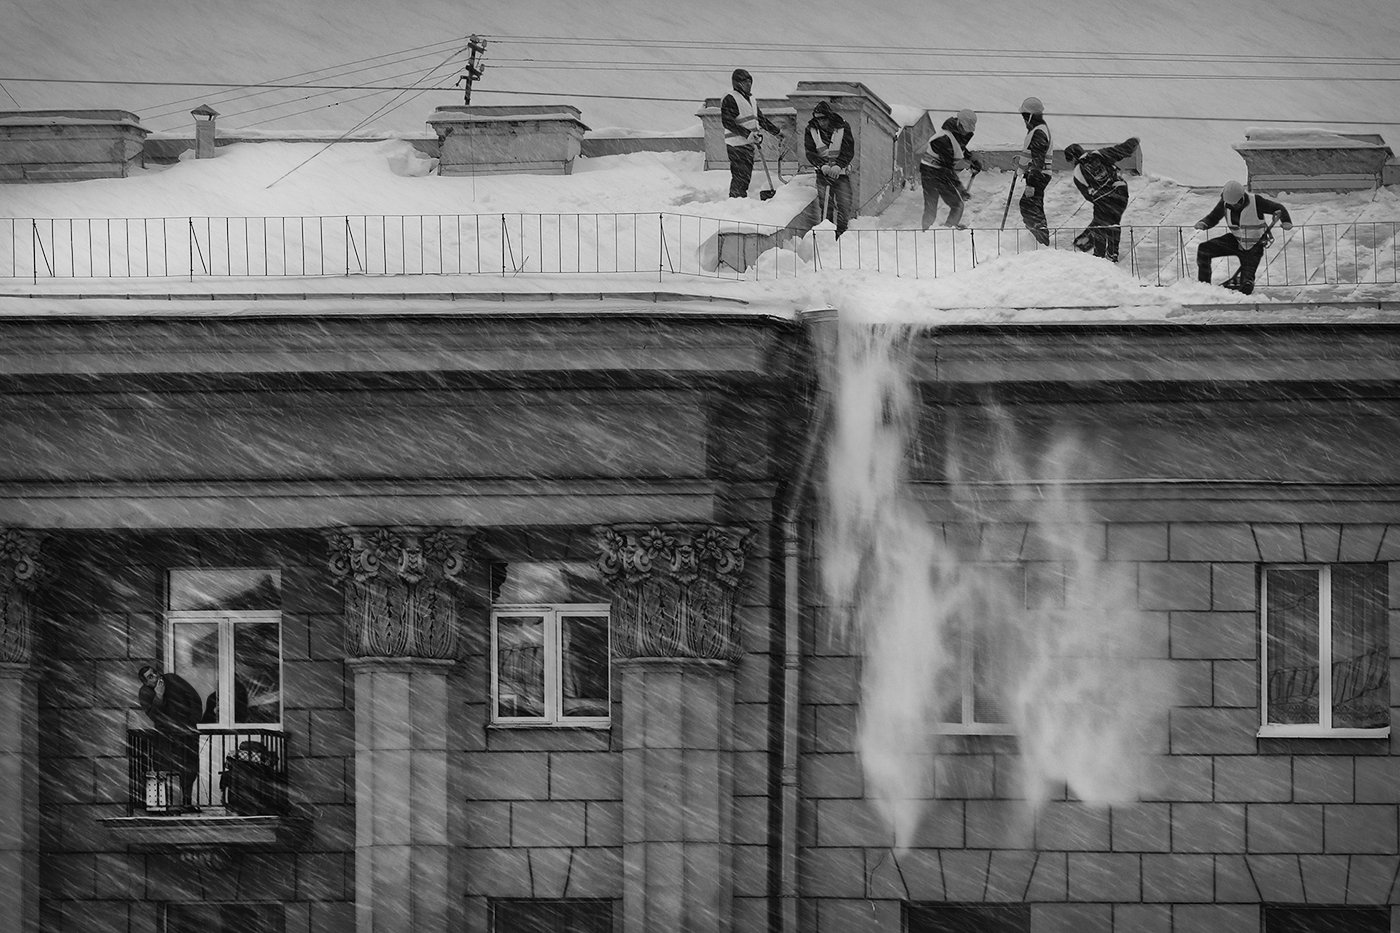 крыша, снег, уборка, снег, метель, работа, опасность, риск, мужики, балкон, питер, Alla Sokolova